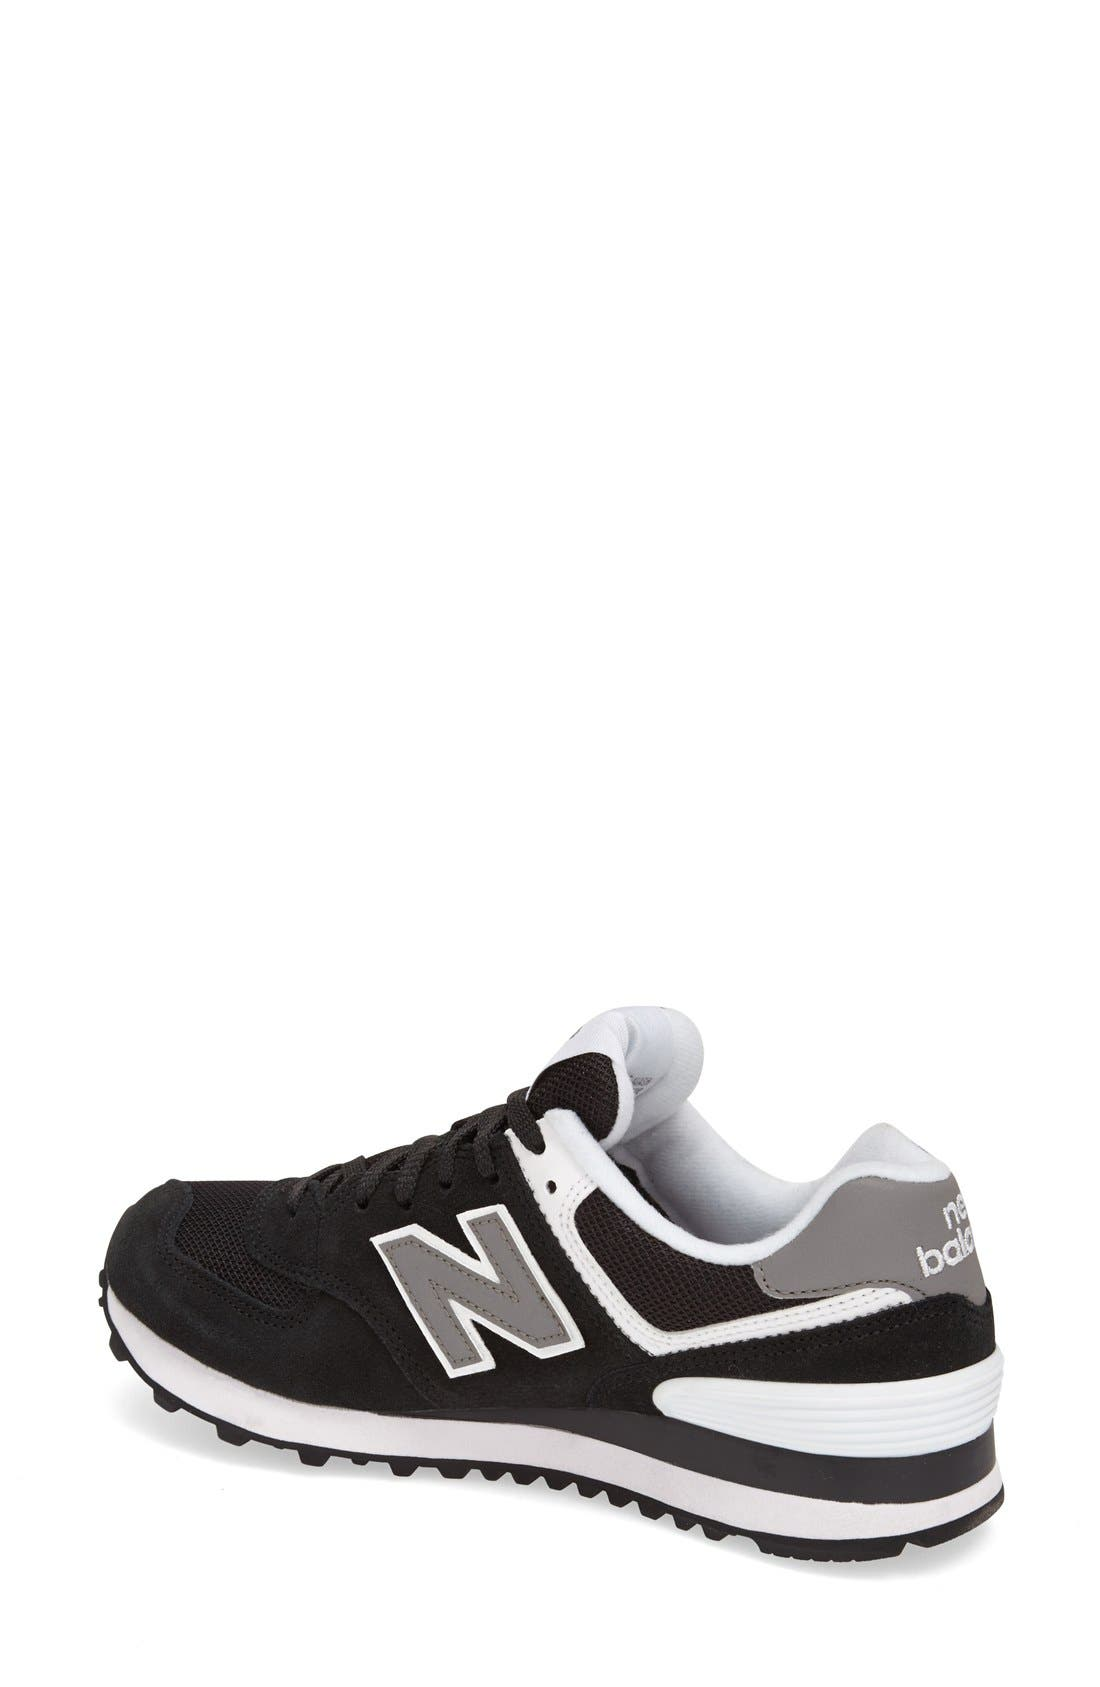 Alternate Image 2  - New Balance '574 Classic' Sneaker (Women)